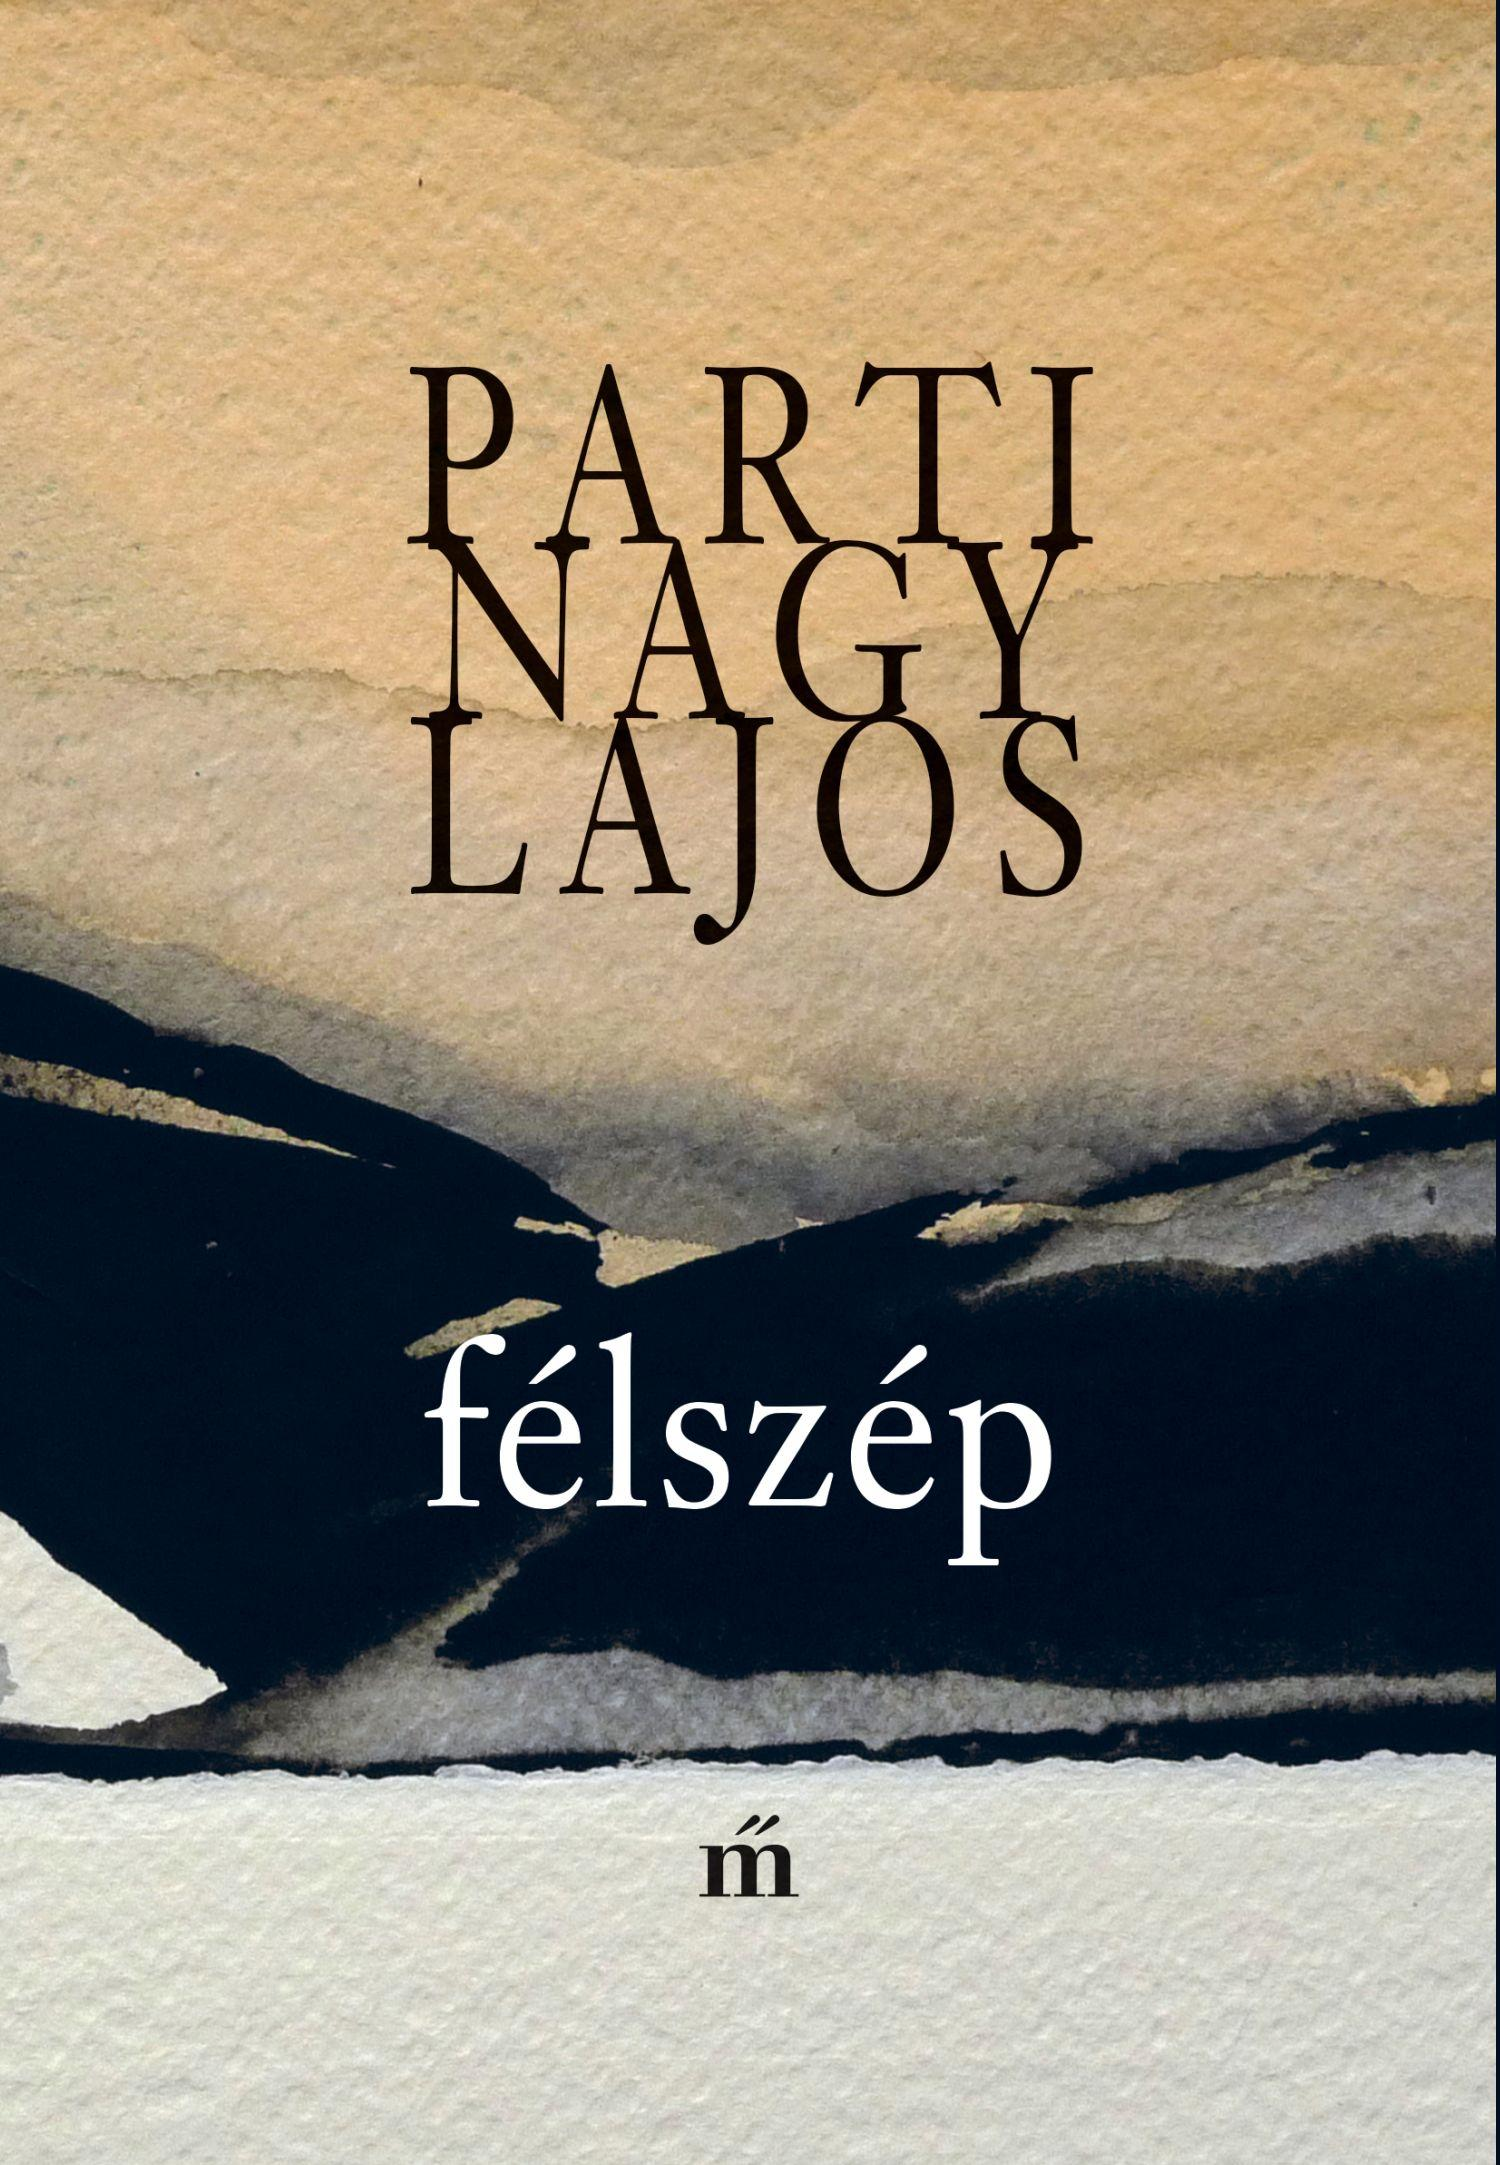 Parti Nagy Lajos: Félszép